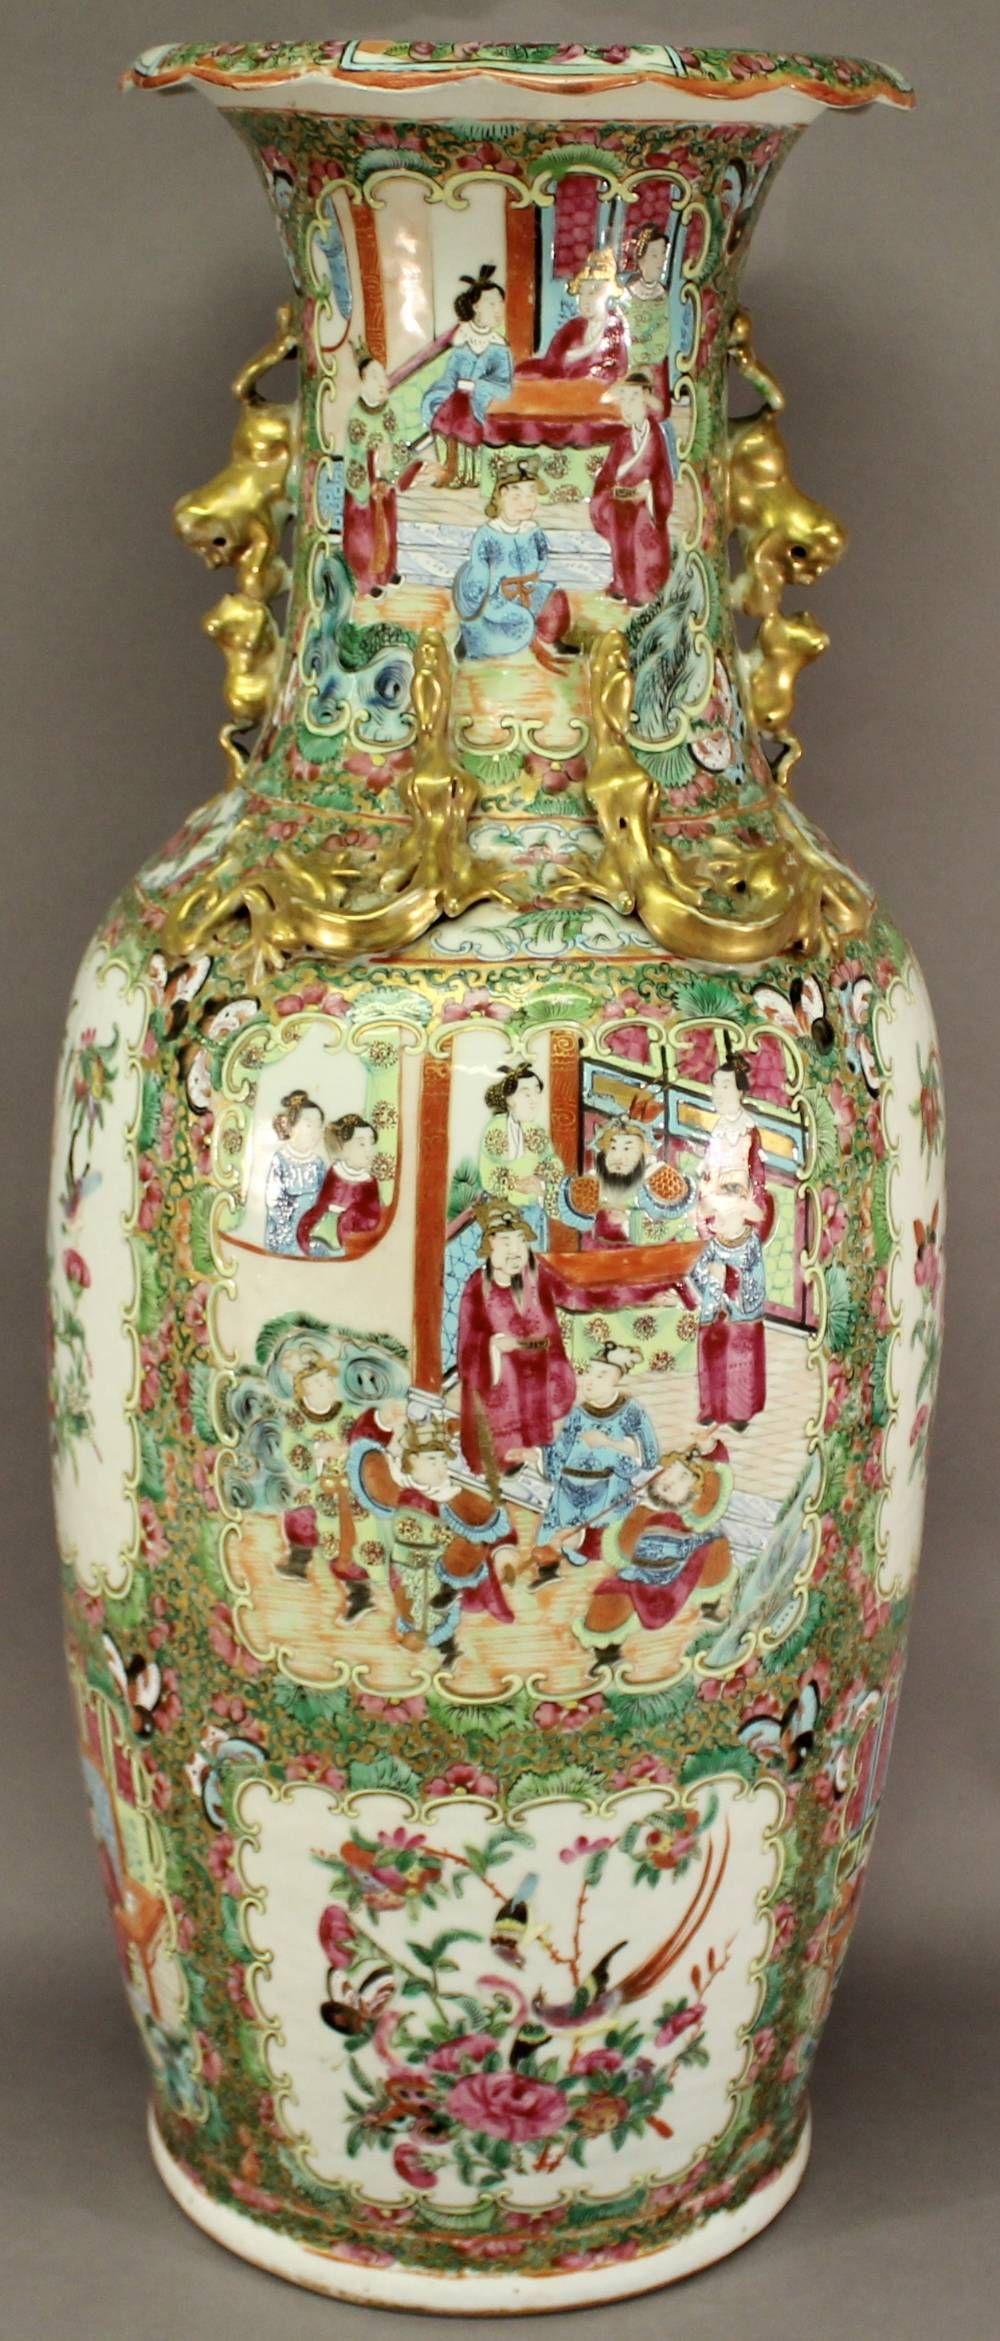 A chinese canton famille rose porcelain vase art more at a chinese canton famille rose porcelain vase art more at fosterginger pinterest reviewsmspy